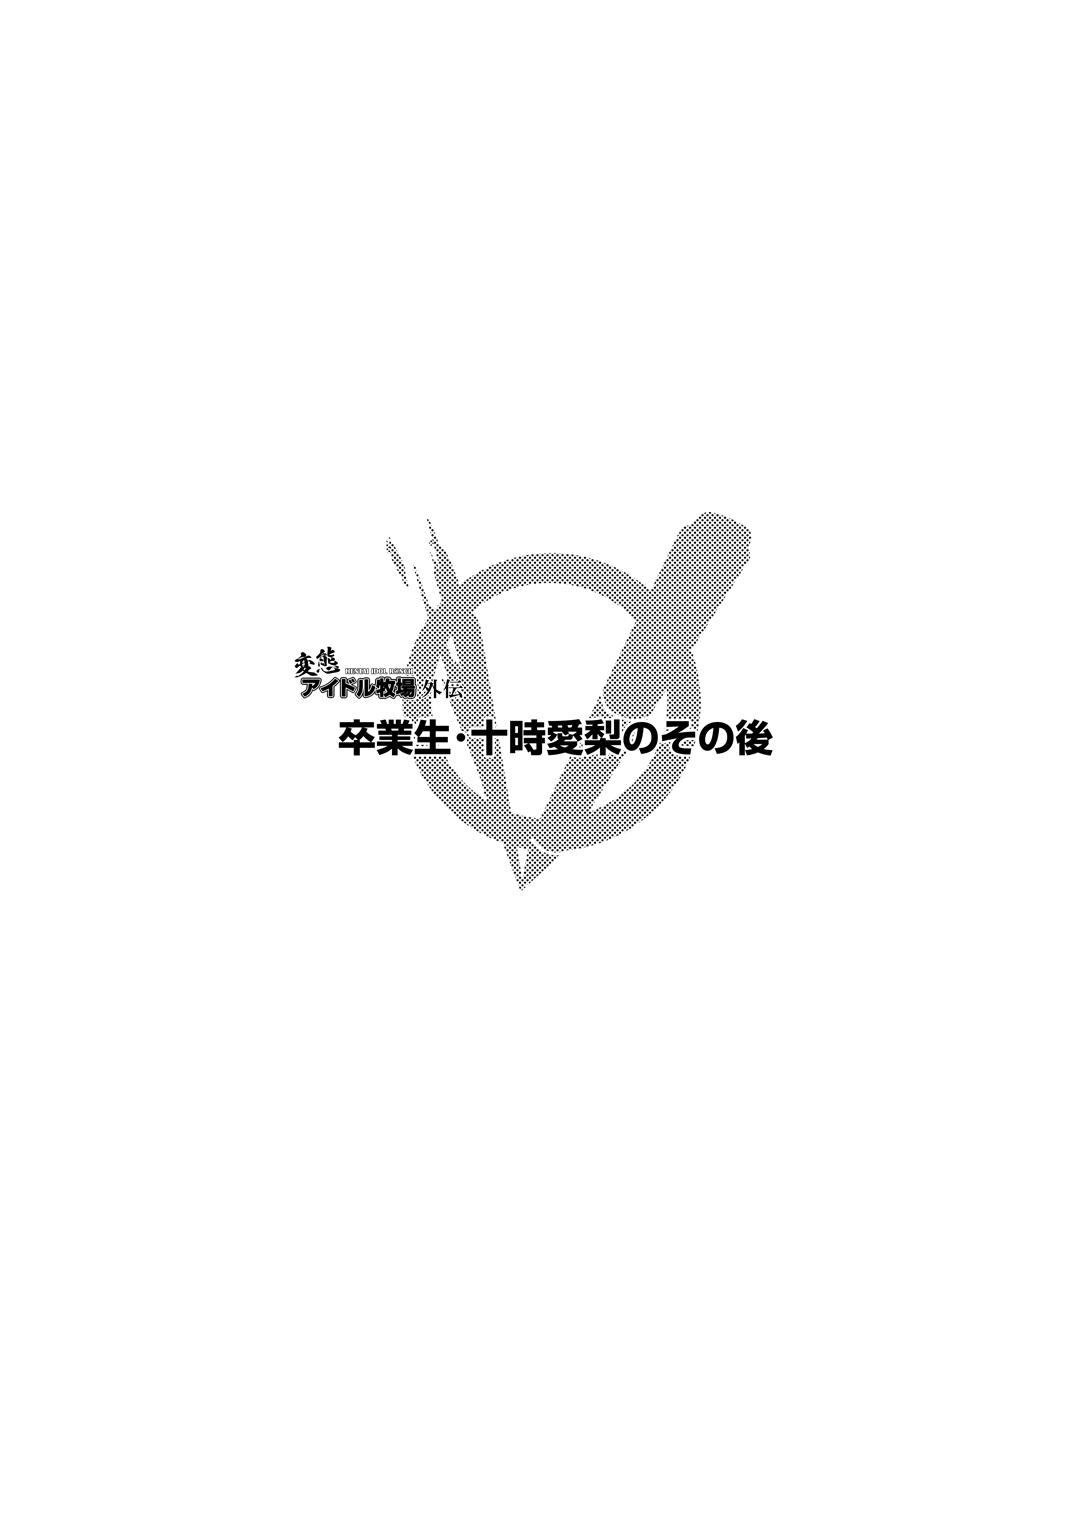 Hentai Idol Bokujou | Hentai Idol Ranch 36